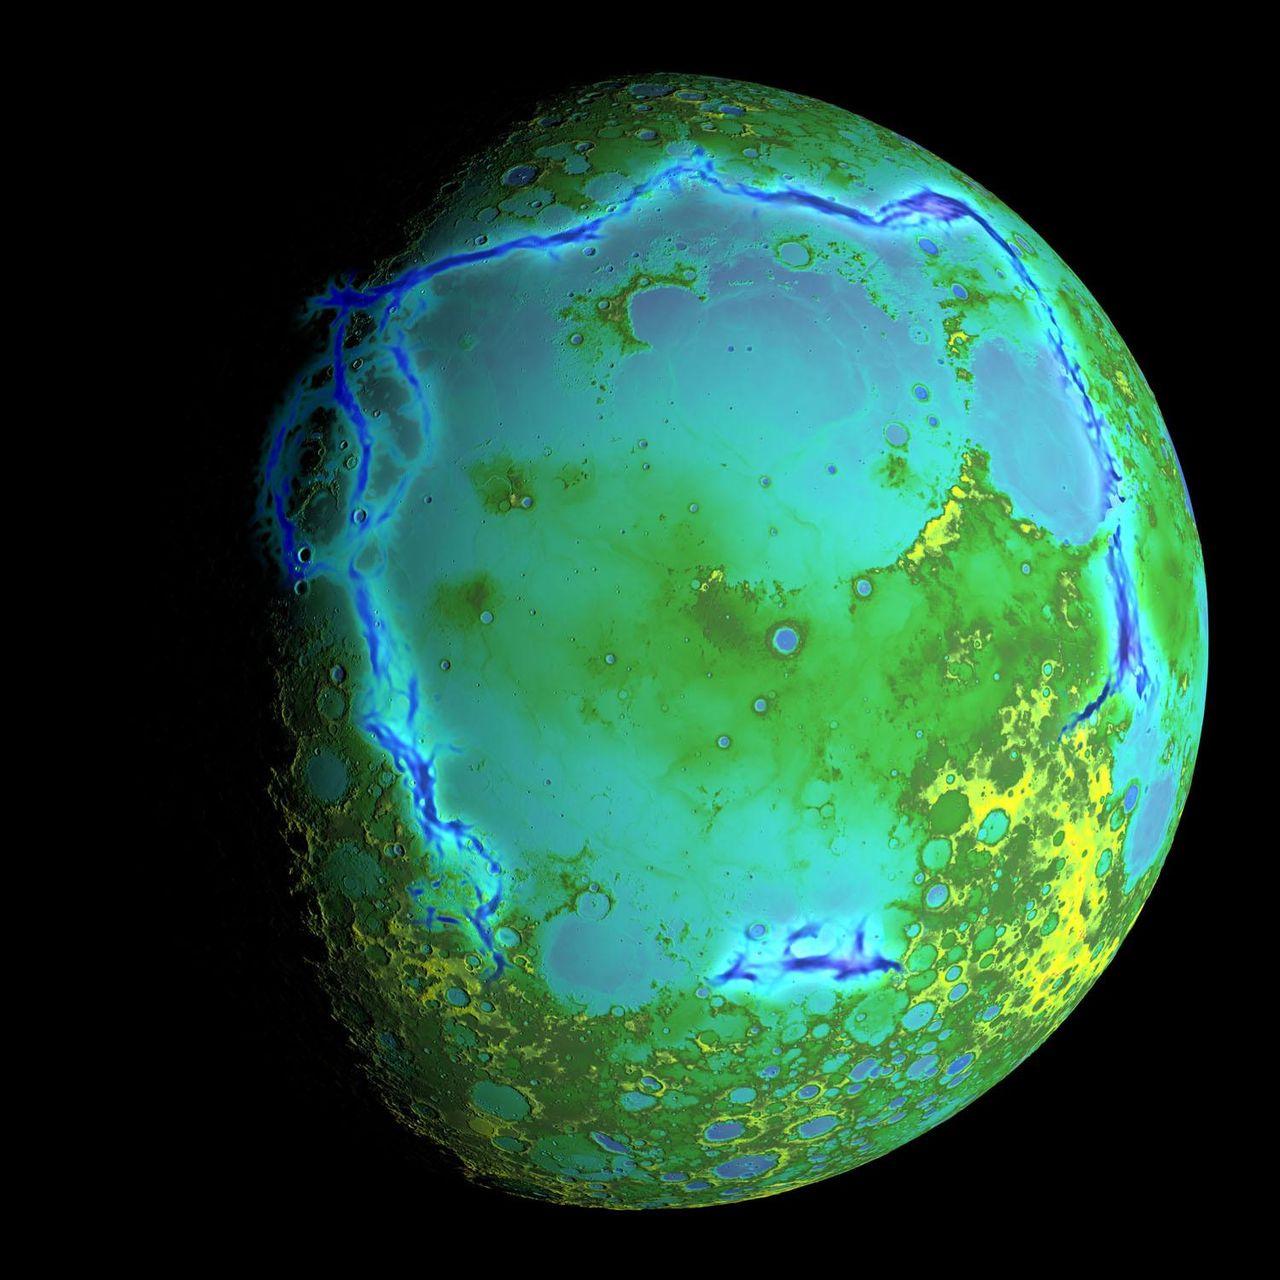 PIA18822-LunarGrailMission-OceanusProcellarum-Rifts-Overall-20141001.jpg.c590e1fa4c0697100d44e45c8169b6f8.jpg